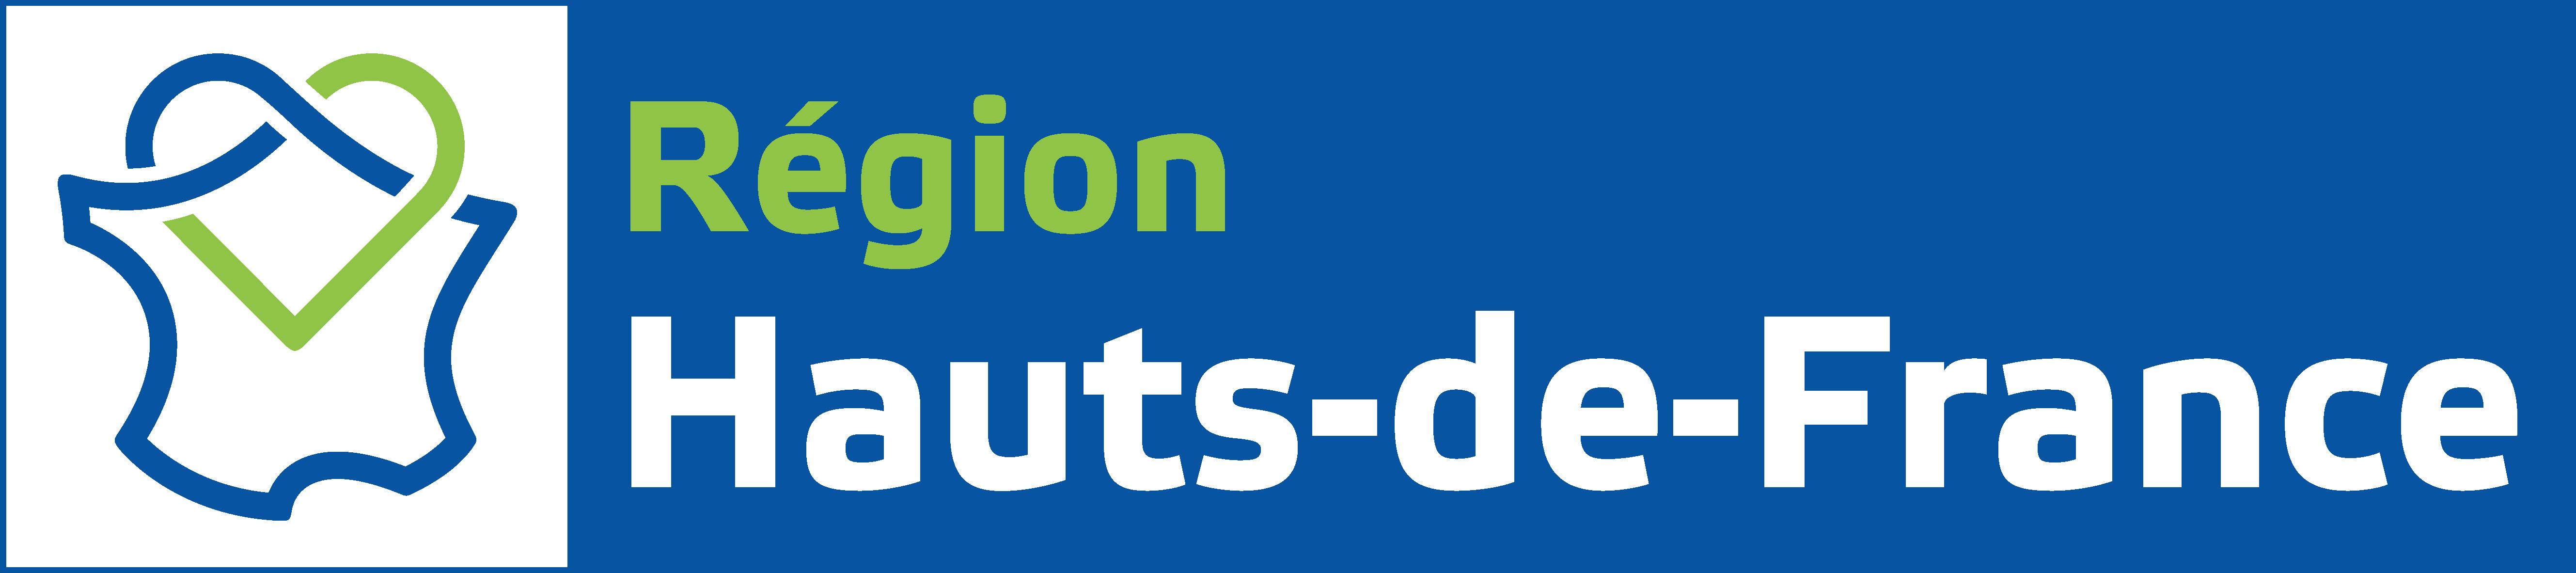 Logo Région HDF - partenaire.jpg